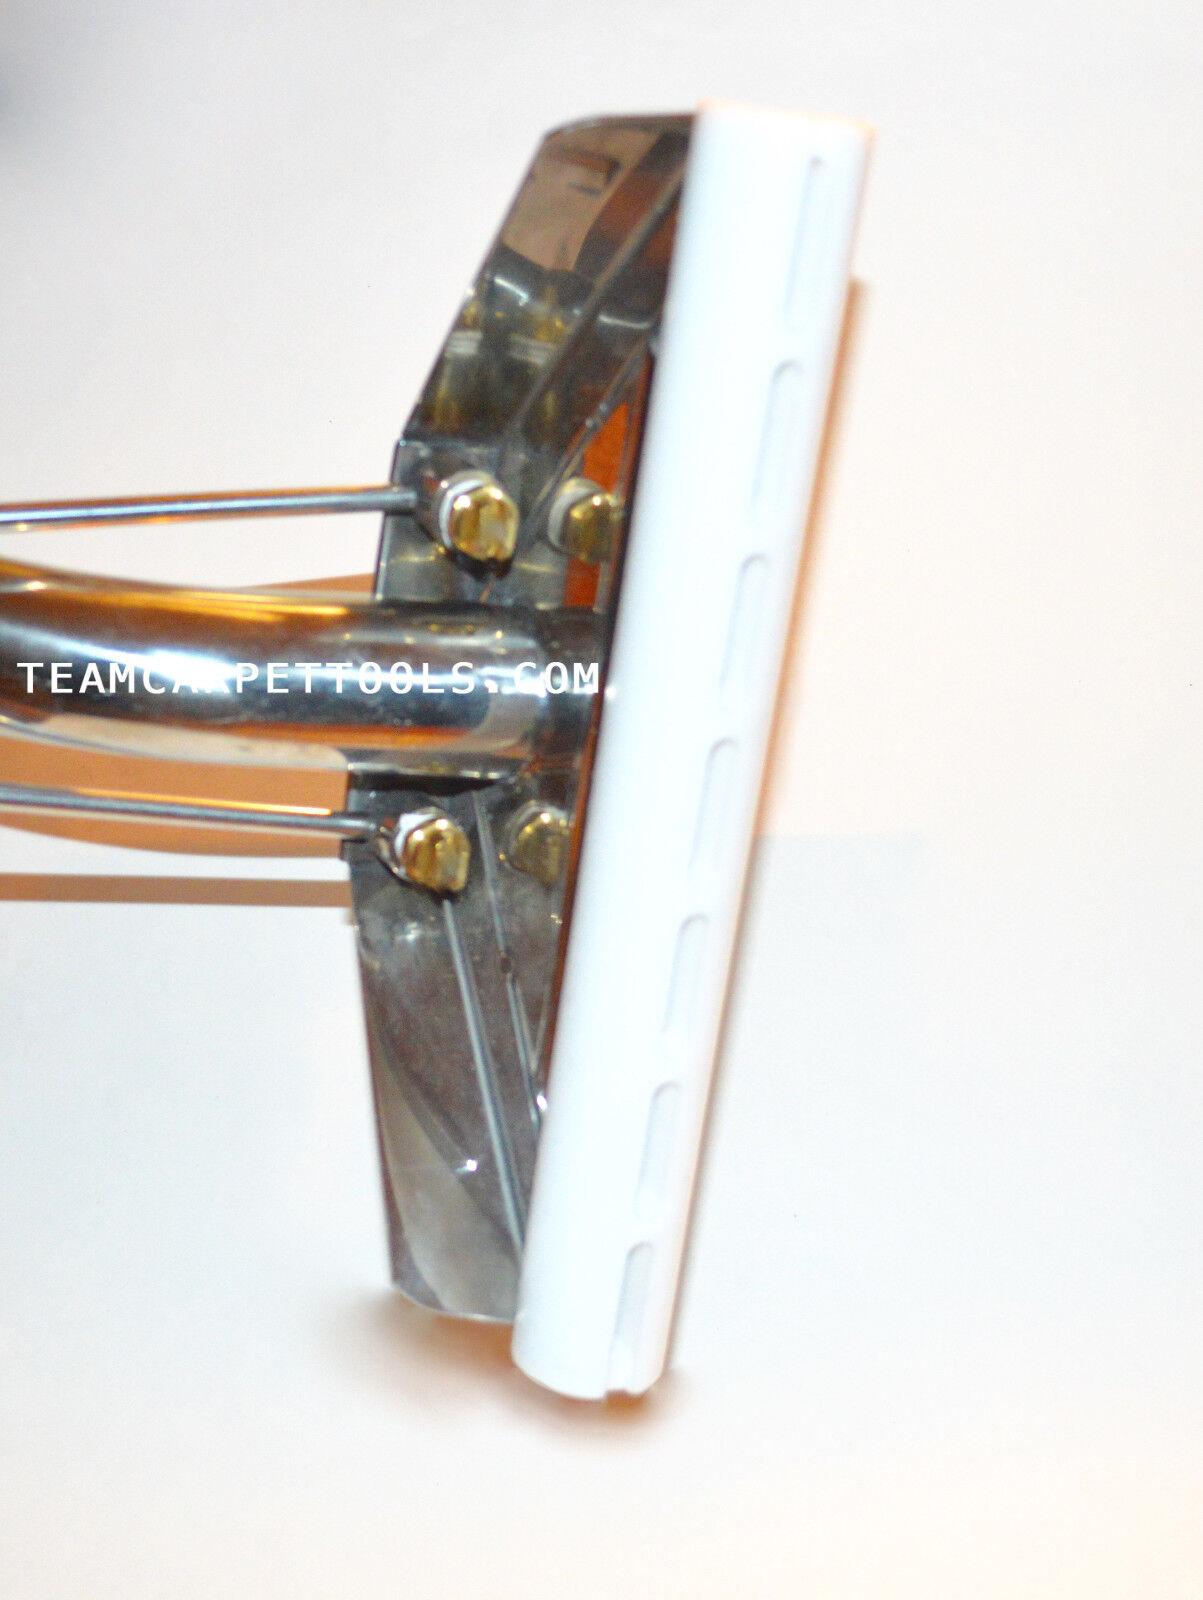 14inch Telfon Glide for CMP VT14 Green Horn Carpet Cleaning Wand Glide